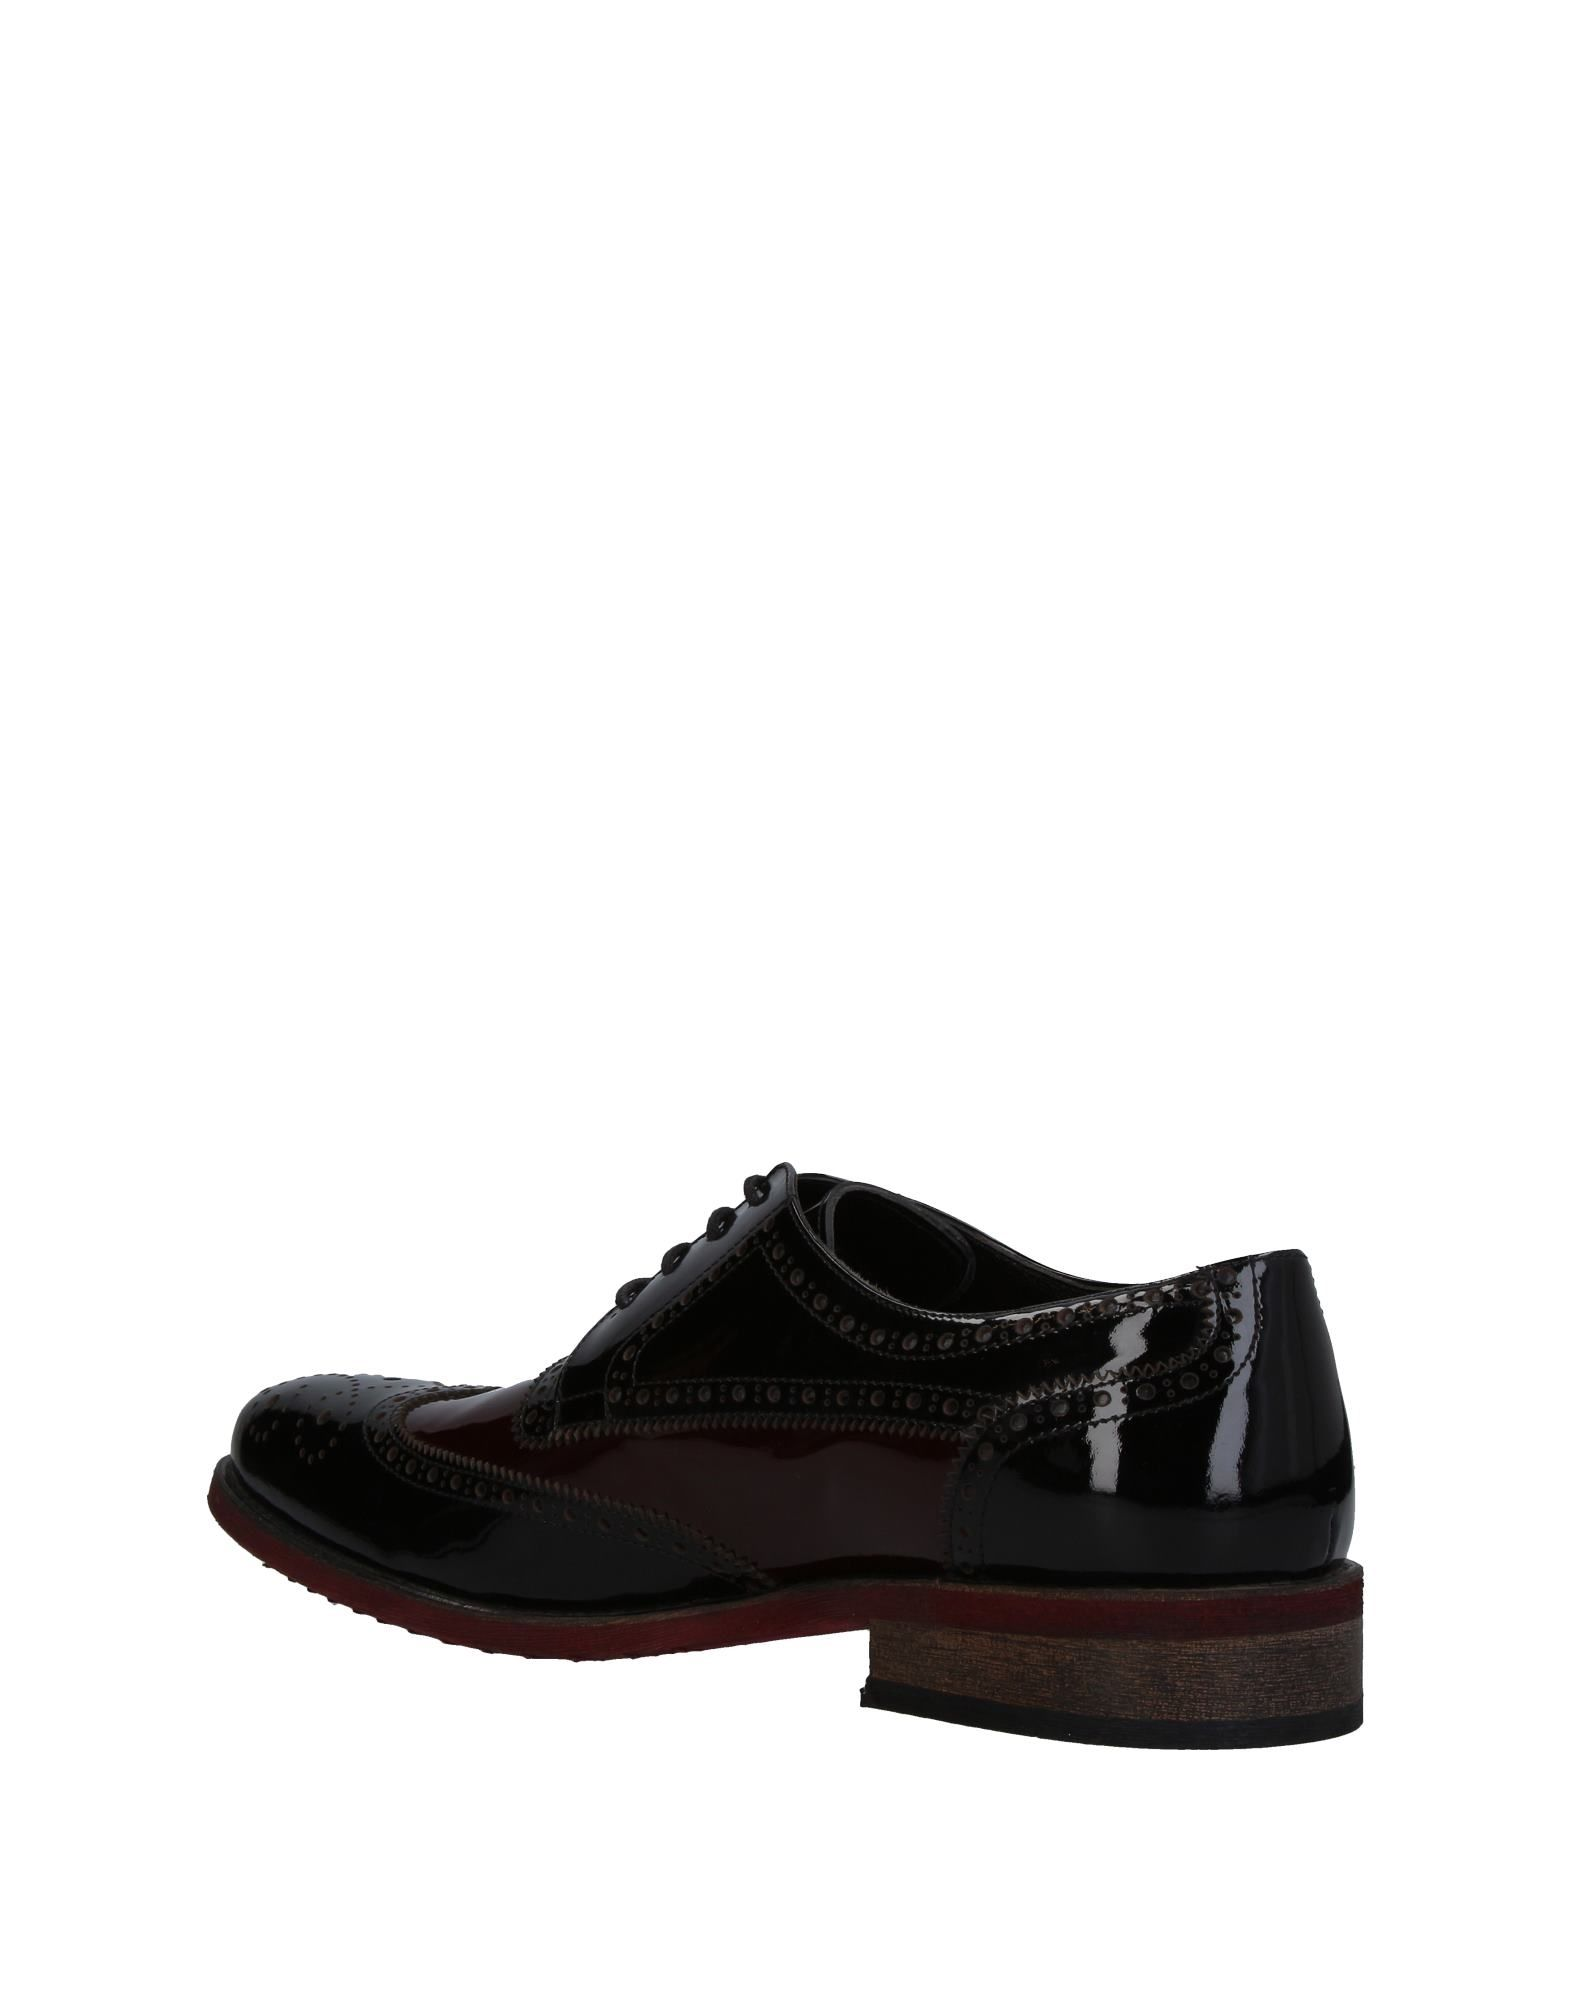 Chaussures à lacets Lloyd Galdo noires Casual homme YsMAA